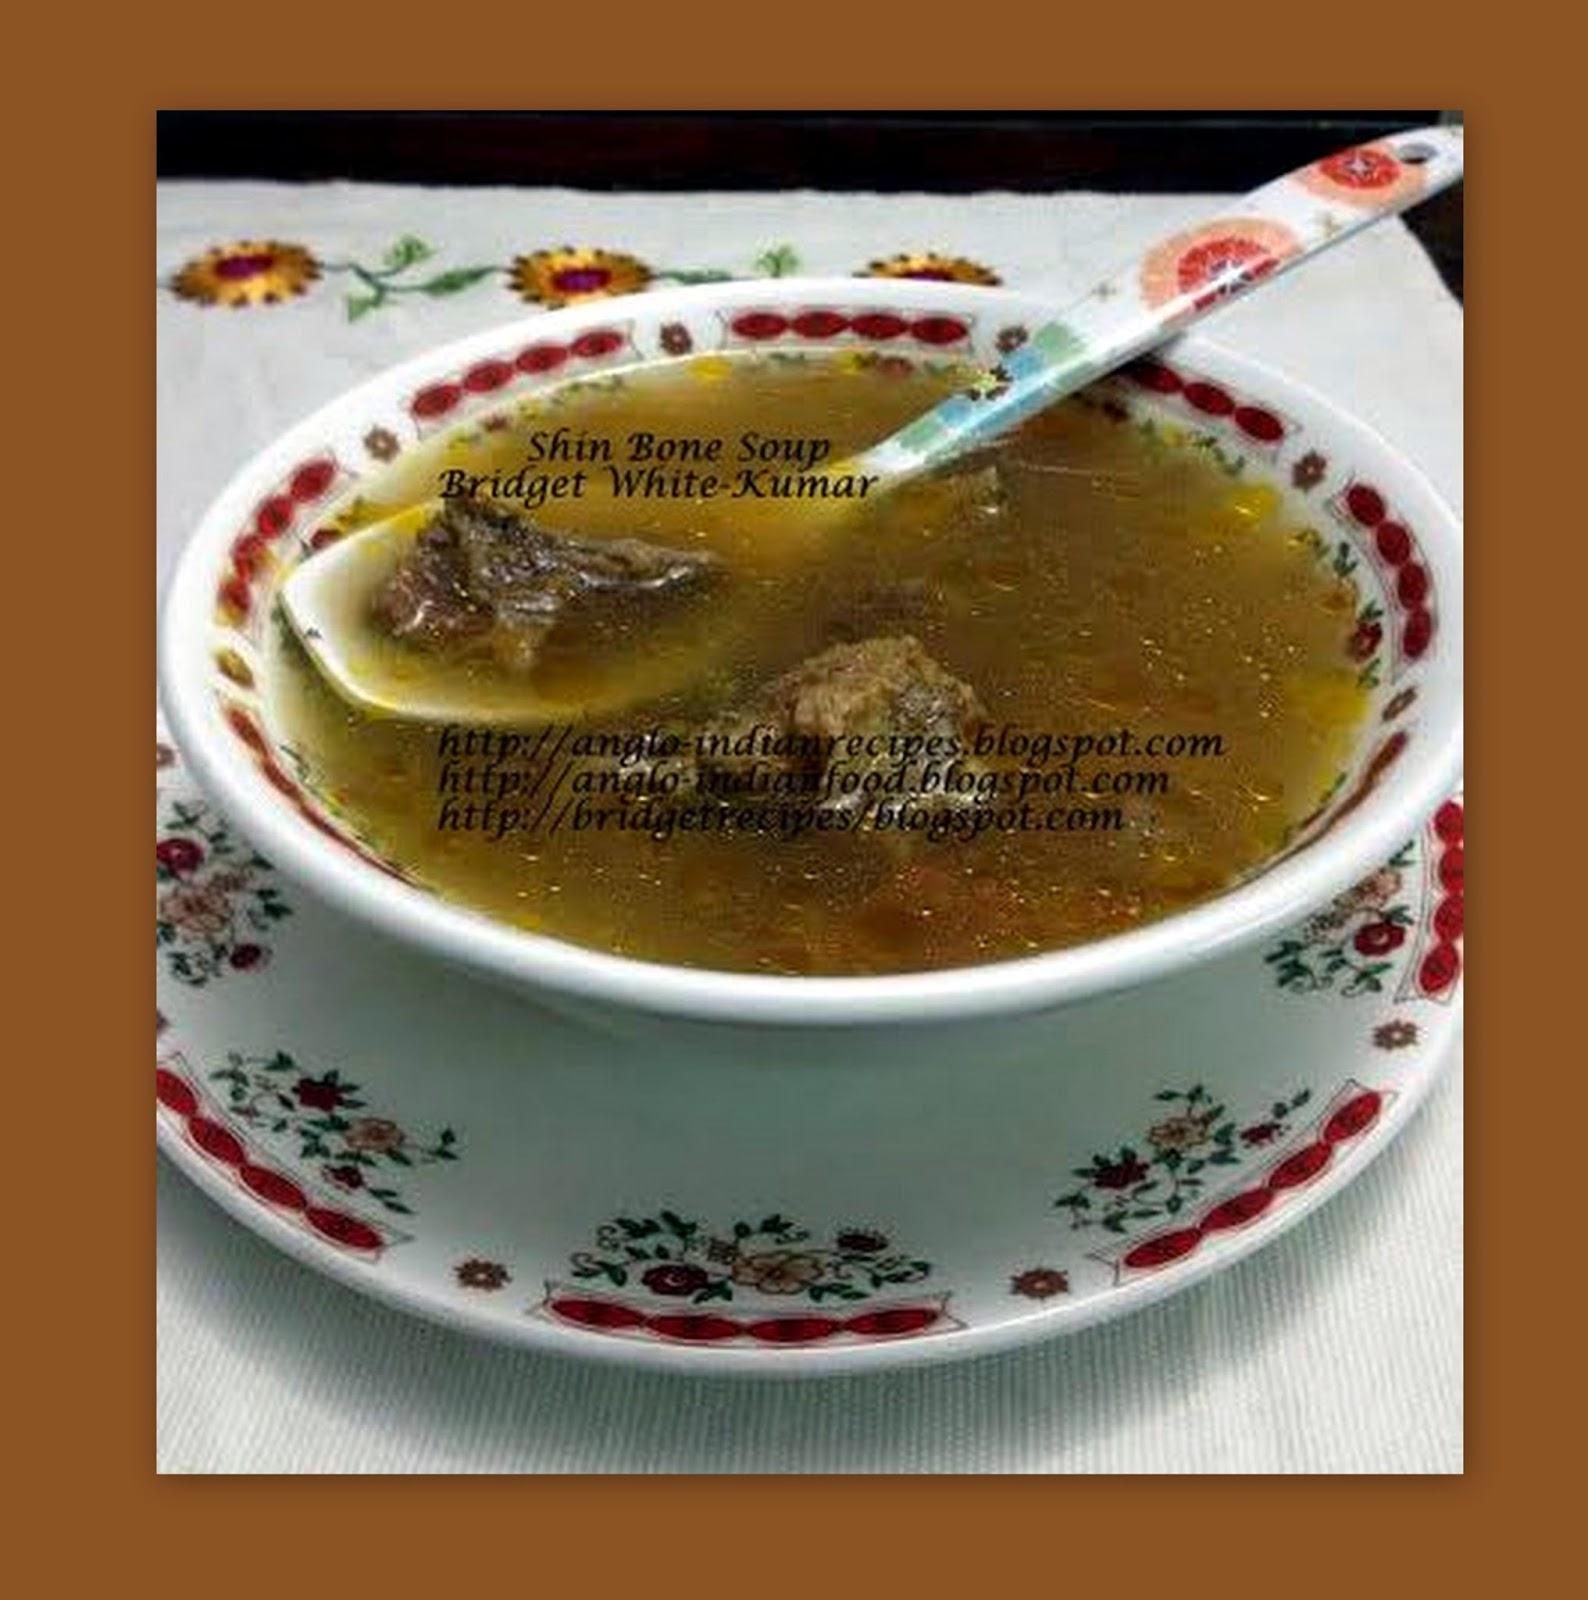 Anglo indian recipes by bridget white shin bone soup shin bone soup forumfinder Choice Image